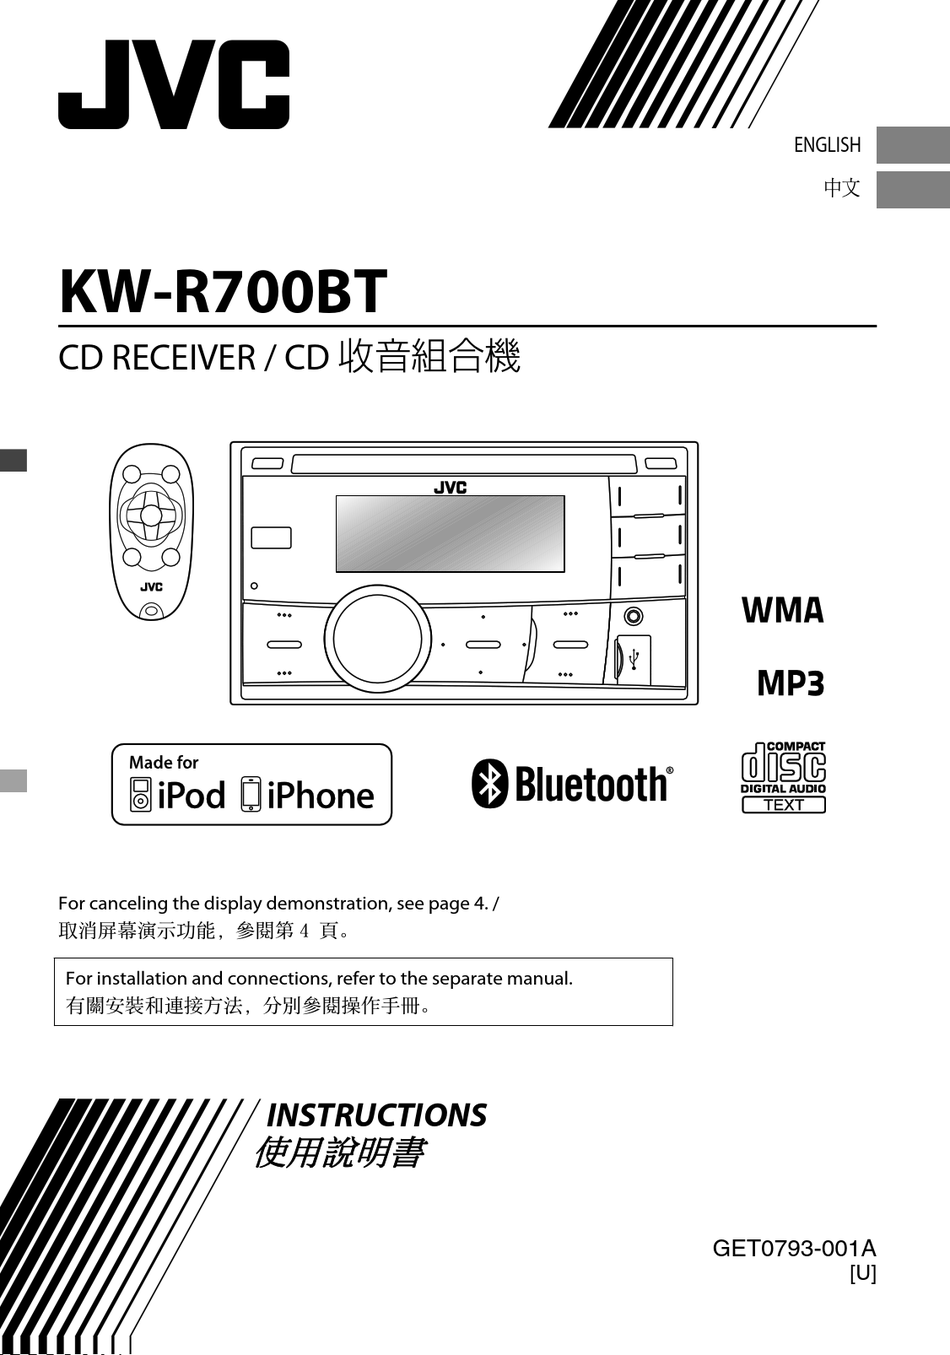 JVC KW-R700BT INSTRUCTIONS MANUAL Pdf Download | ManualsLib | Jvc Kw R500 Car Stereo Wiring Diagram |  | ManualsLib